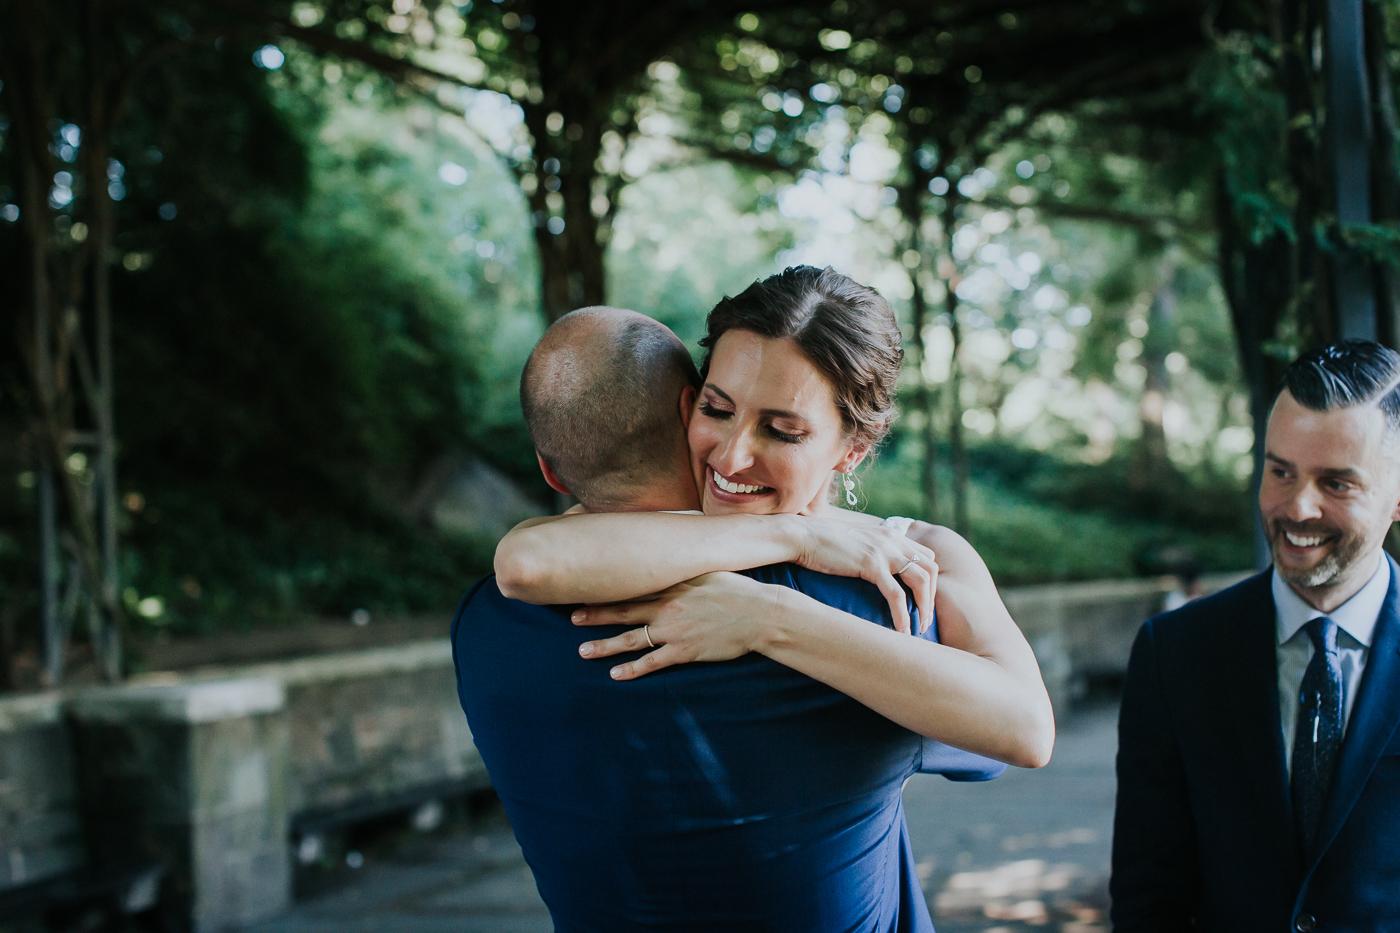 NYC-Central-Park-Conservatory-Garden-Intimate-Elopement-Documentary-Wedding-Photographer-27.jpg